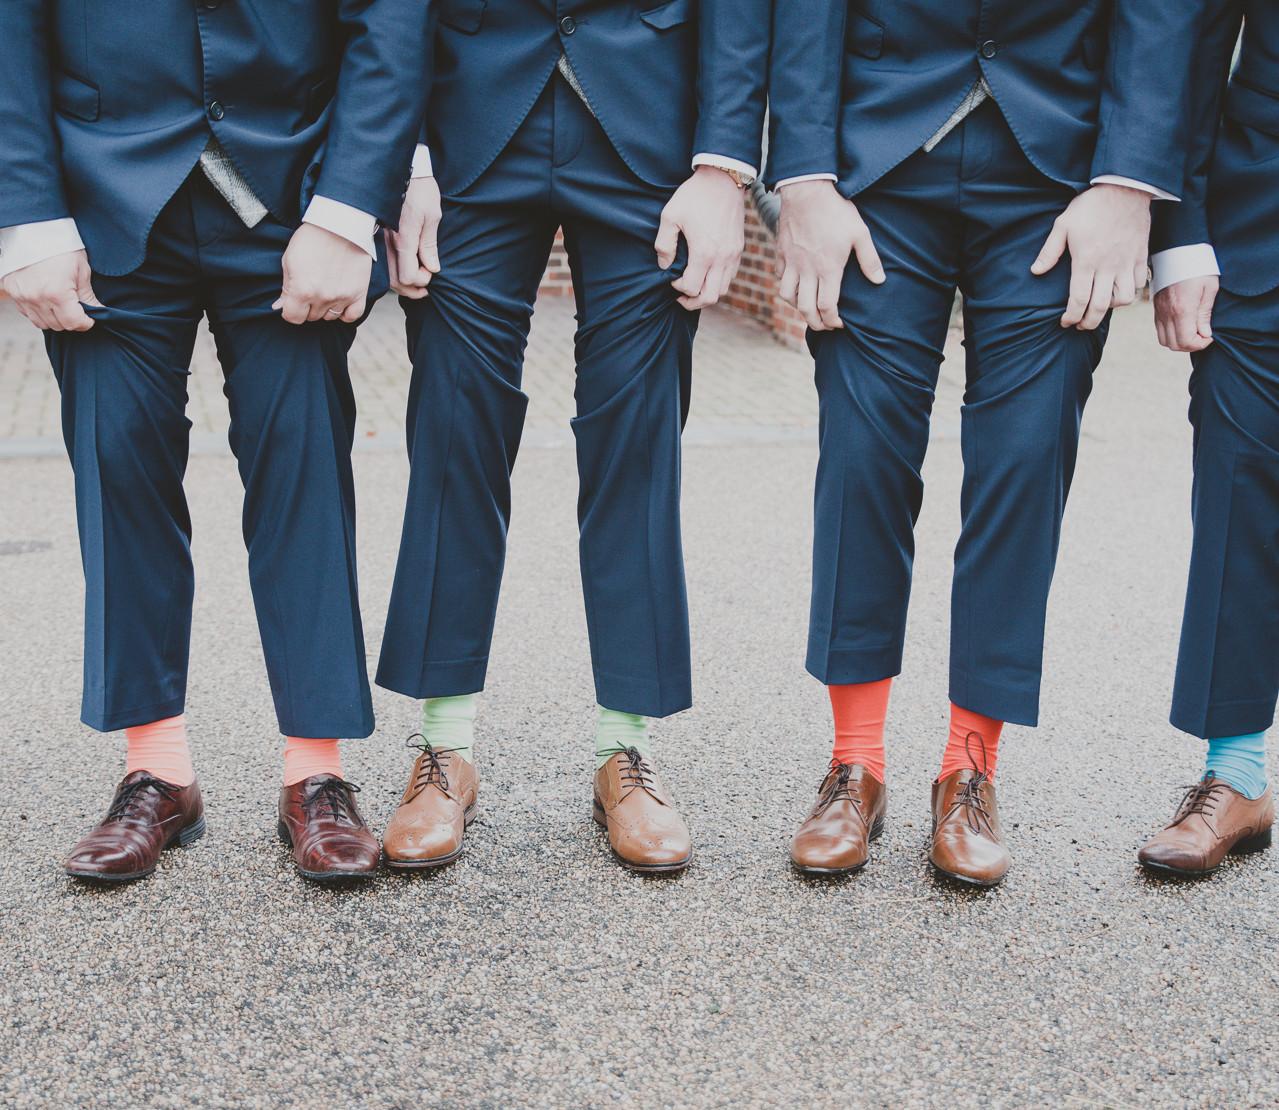 Fay Wedding - Thursford Collection at the Garden Pavilion, Norfolk. Coloured socks.